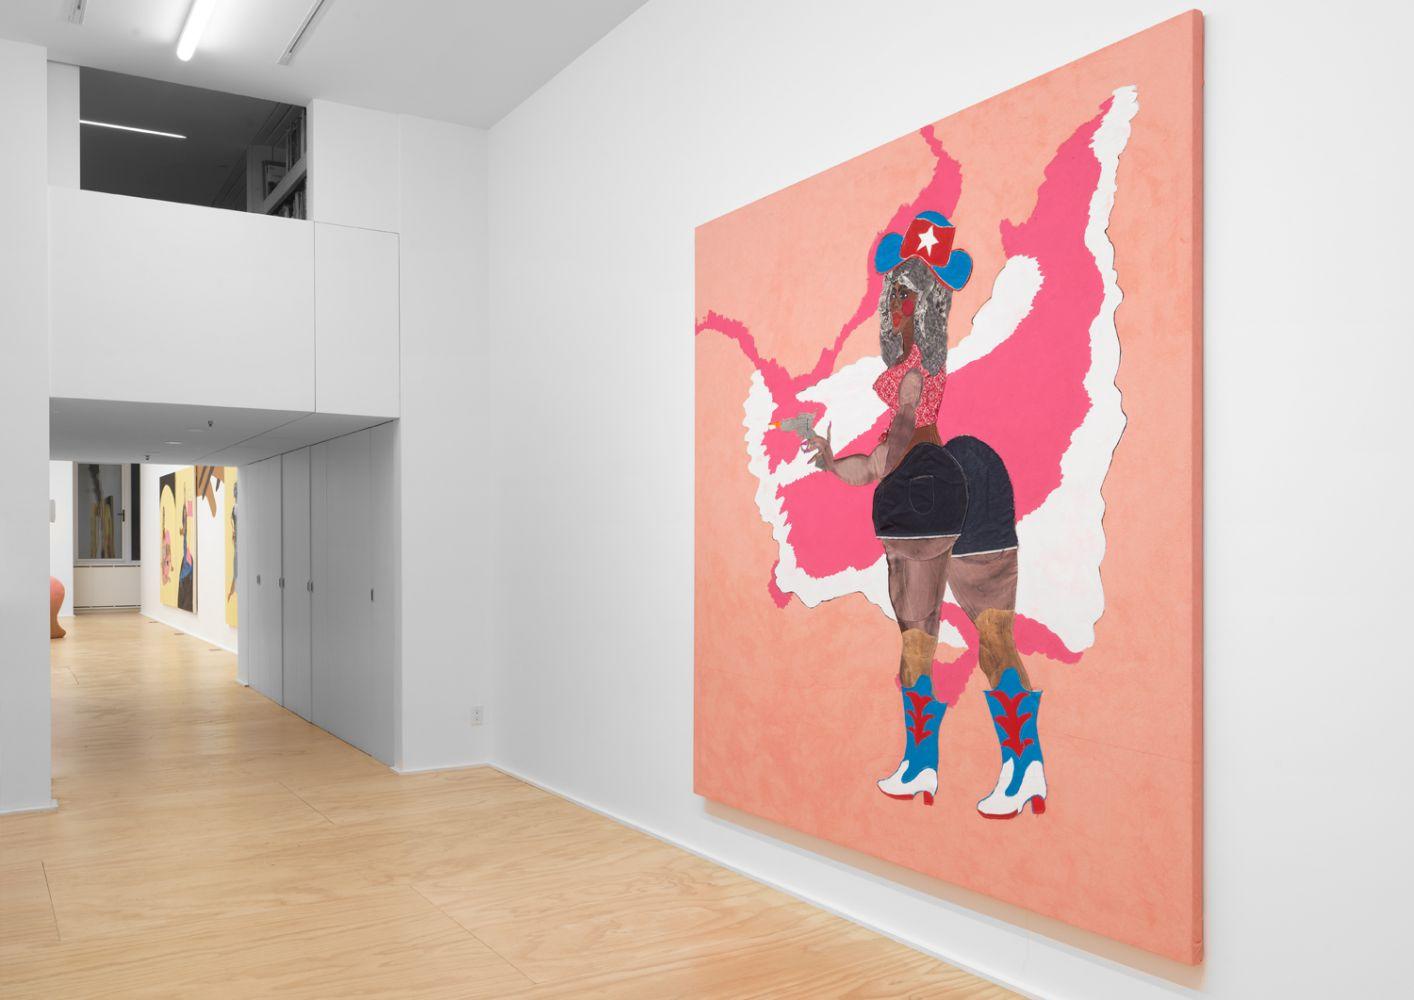 Exhibition View, Tschabalala Self, Cotton Mouth, Eva Presenhuber, New York, 2020 install 1